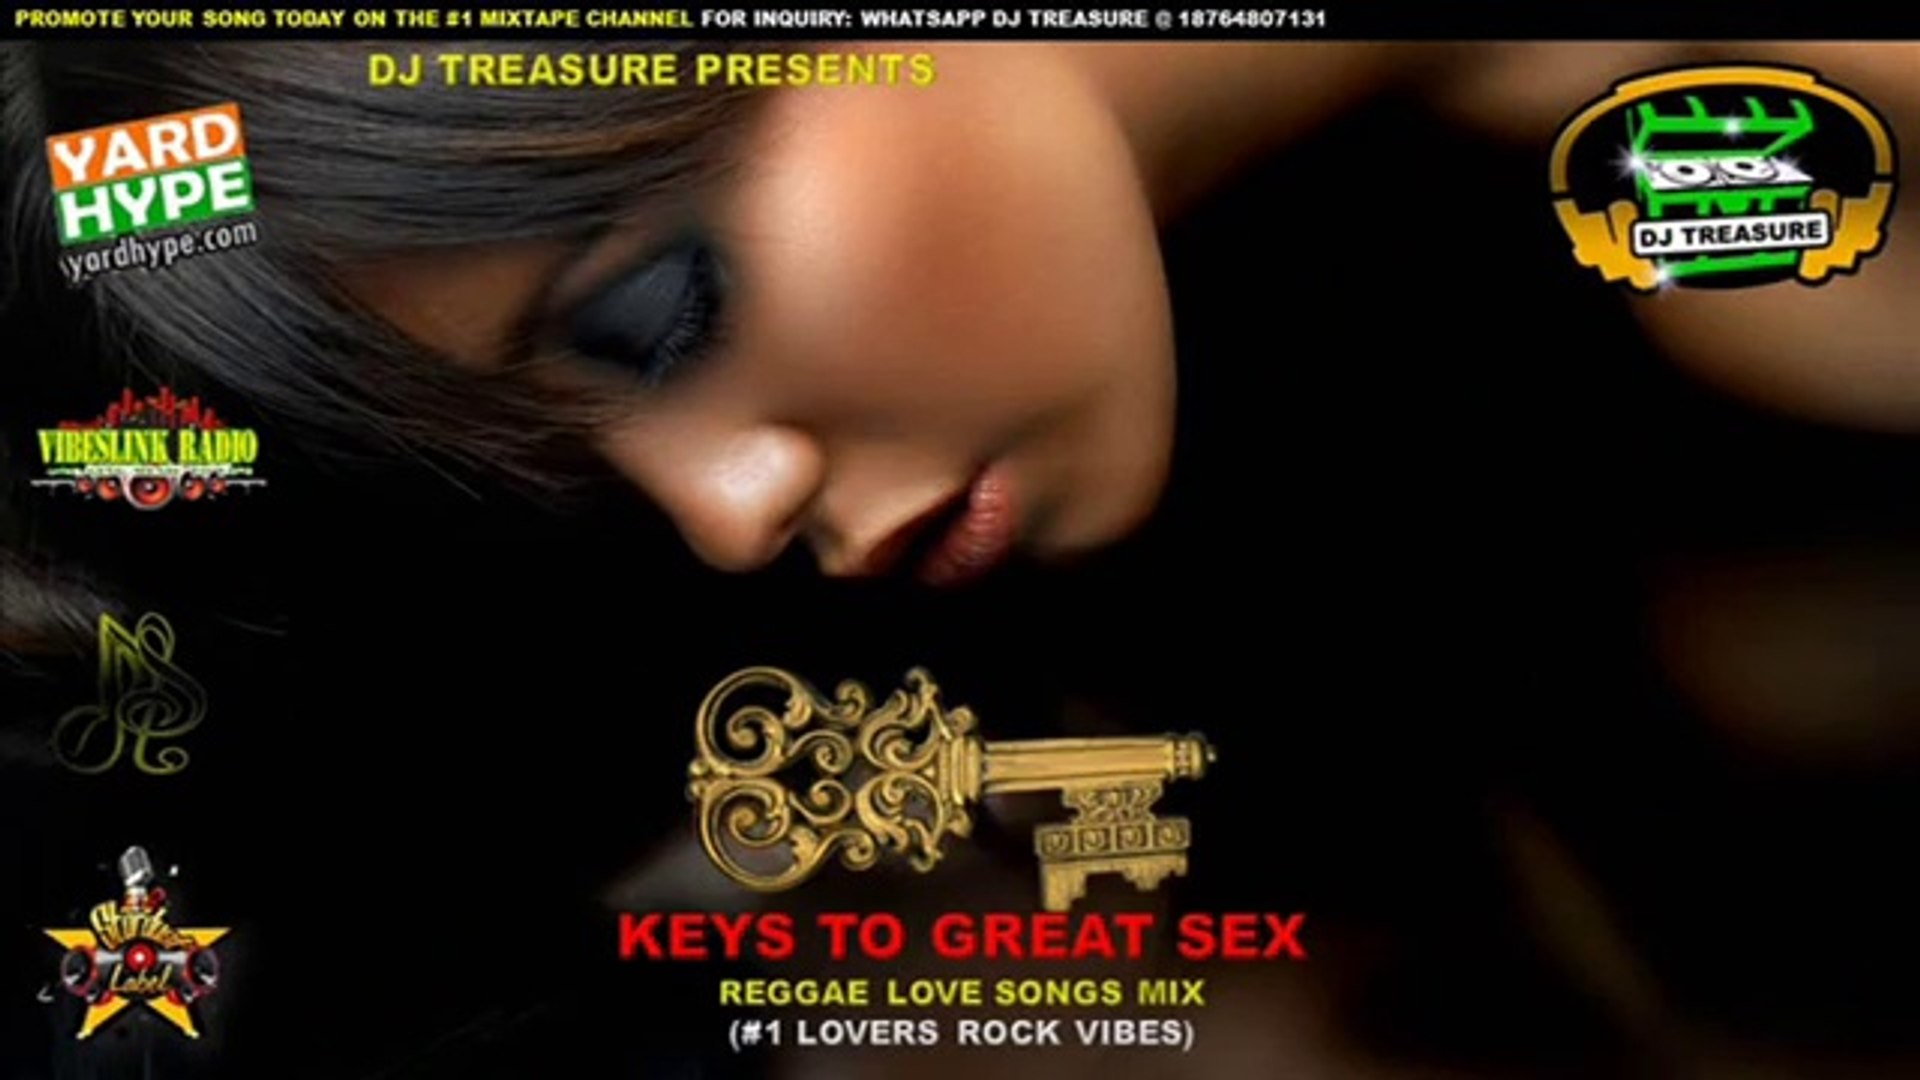 BEST REGGAE MUSIC LOVE SONGS MIX 2017 (REGGAE COVER OF POPULAR SONGS) RAD  DIXON GHOST